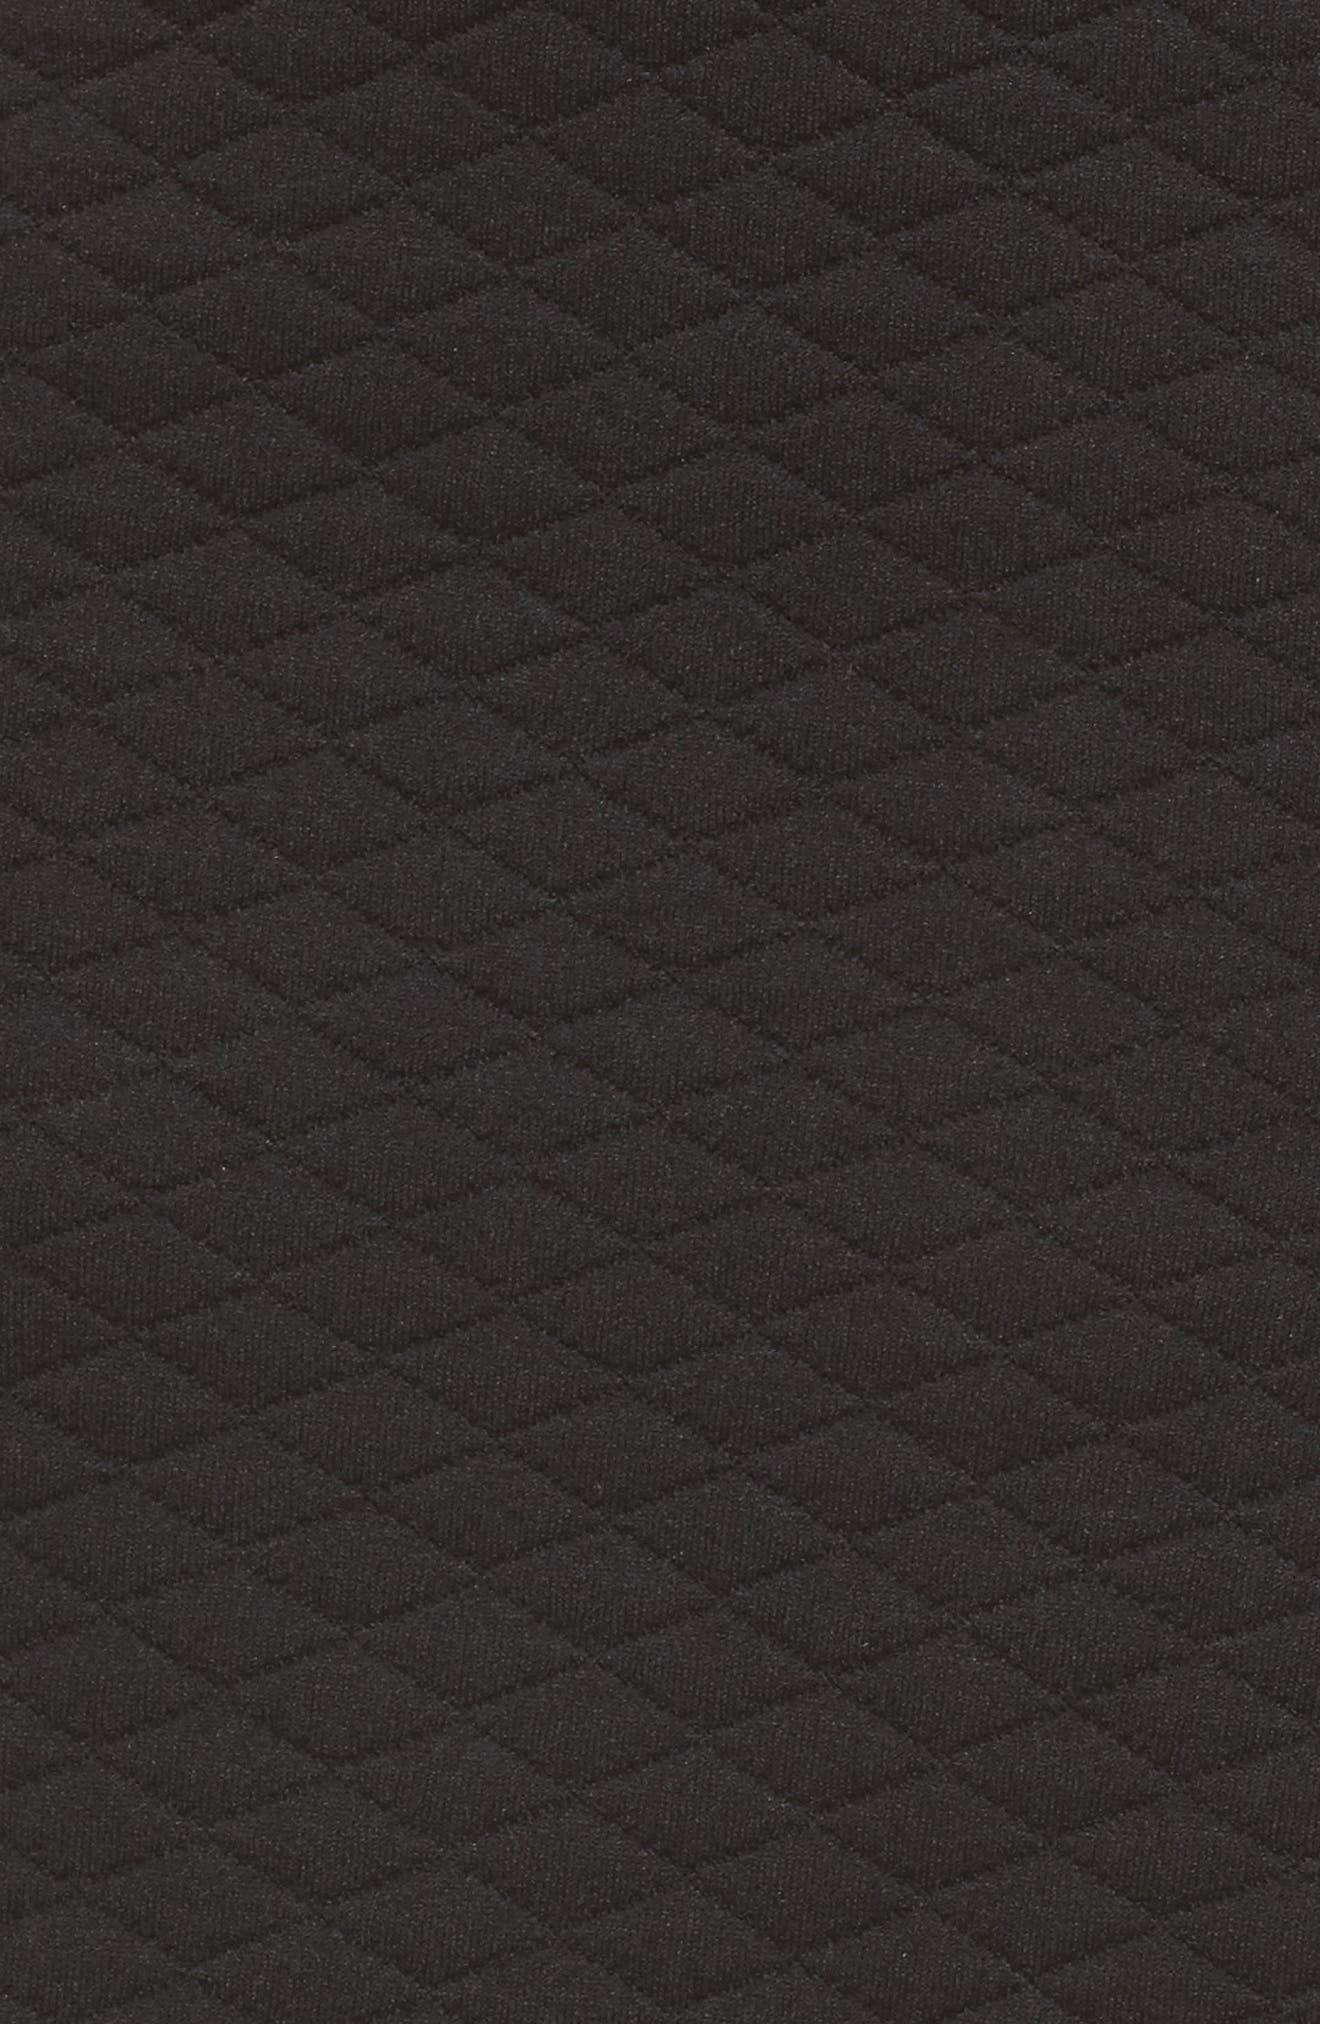 Andi Miniskirt,                             Alternate thumbnail 5, color,